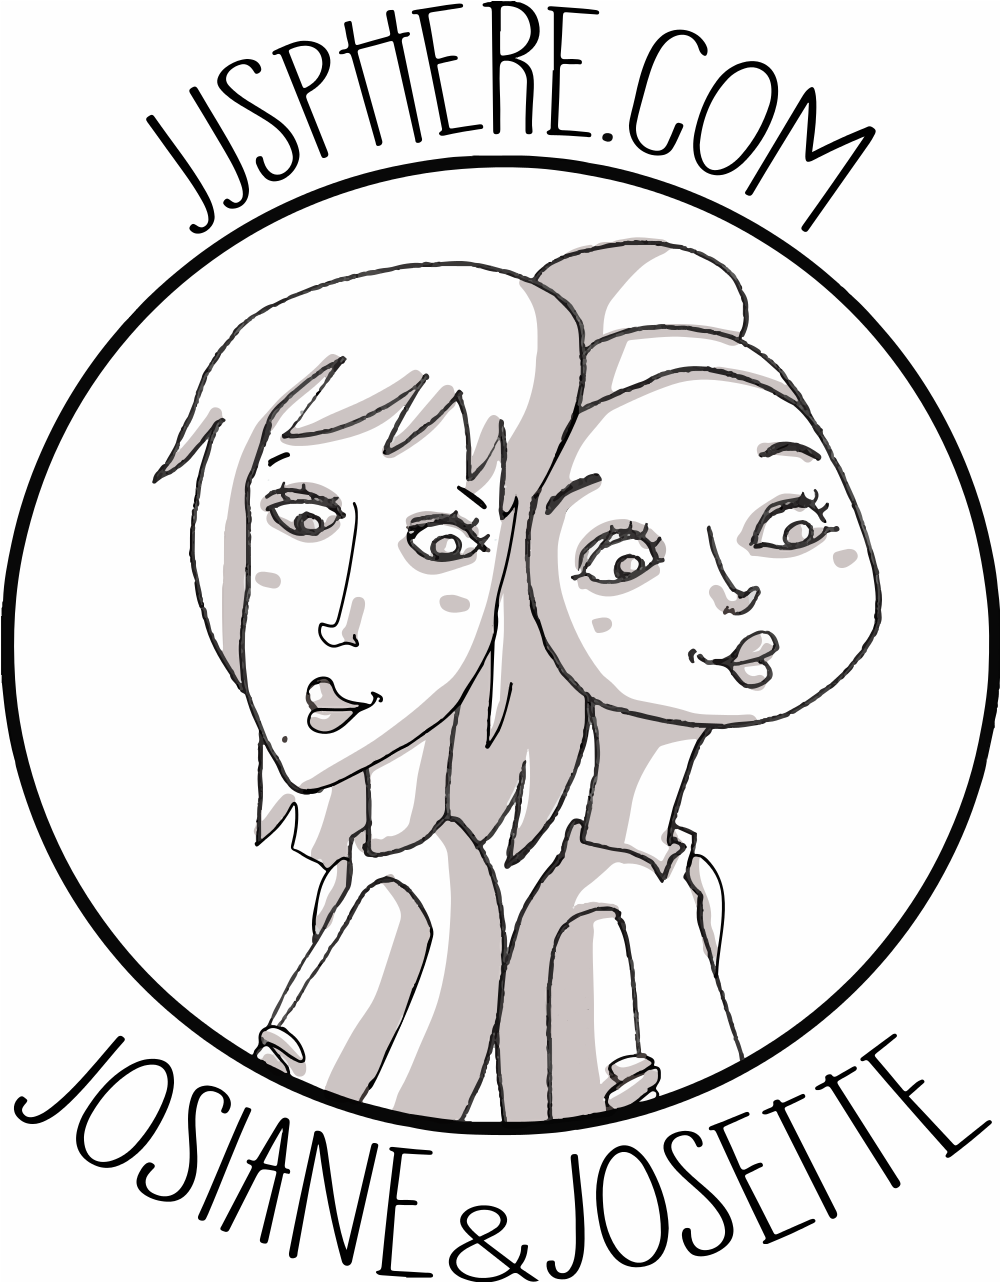 JJSPHERE.com